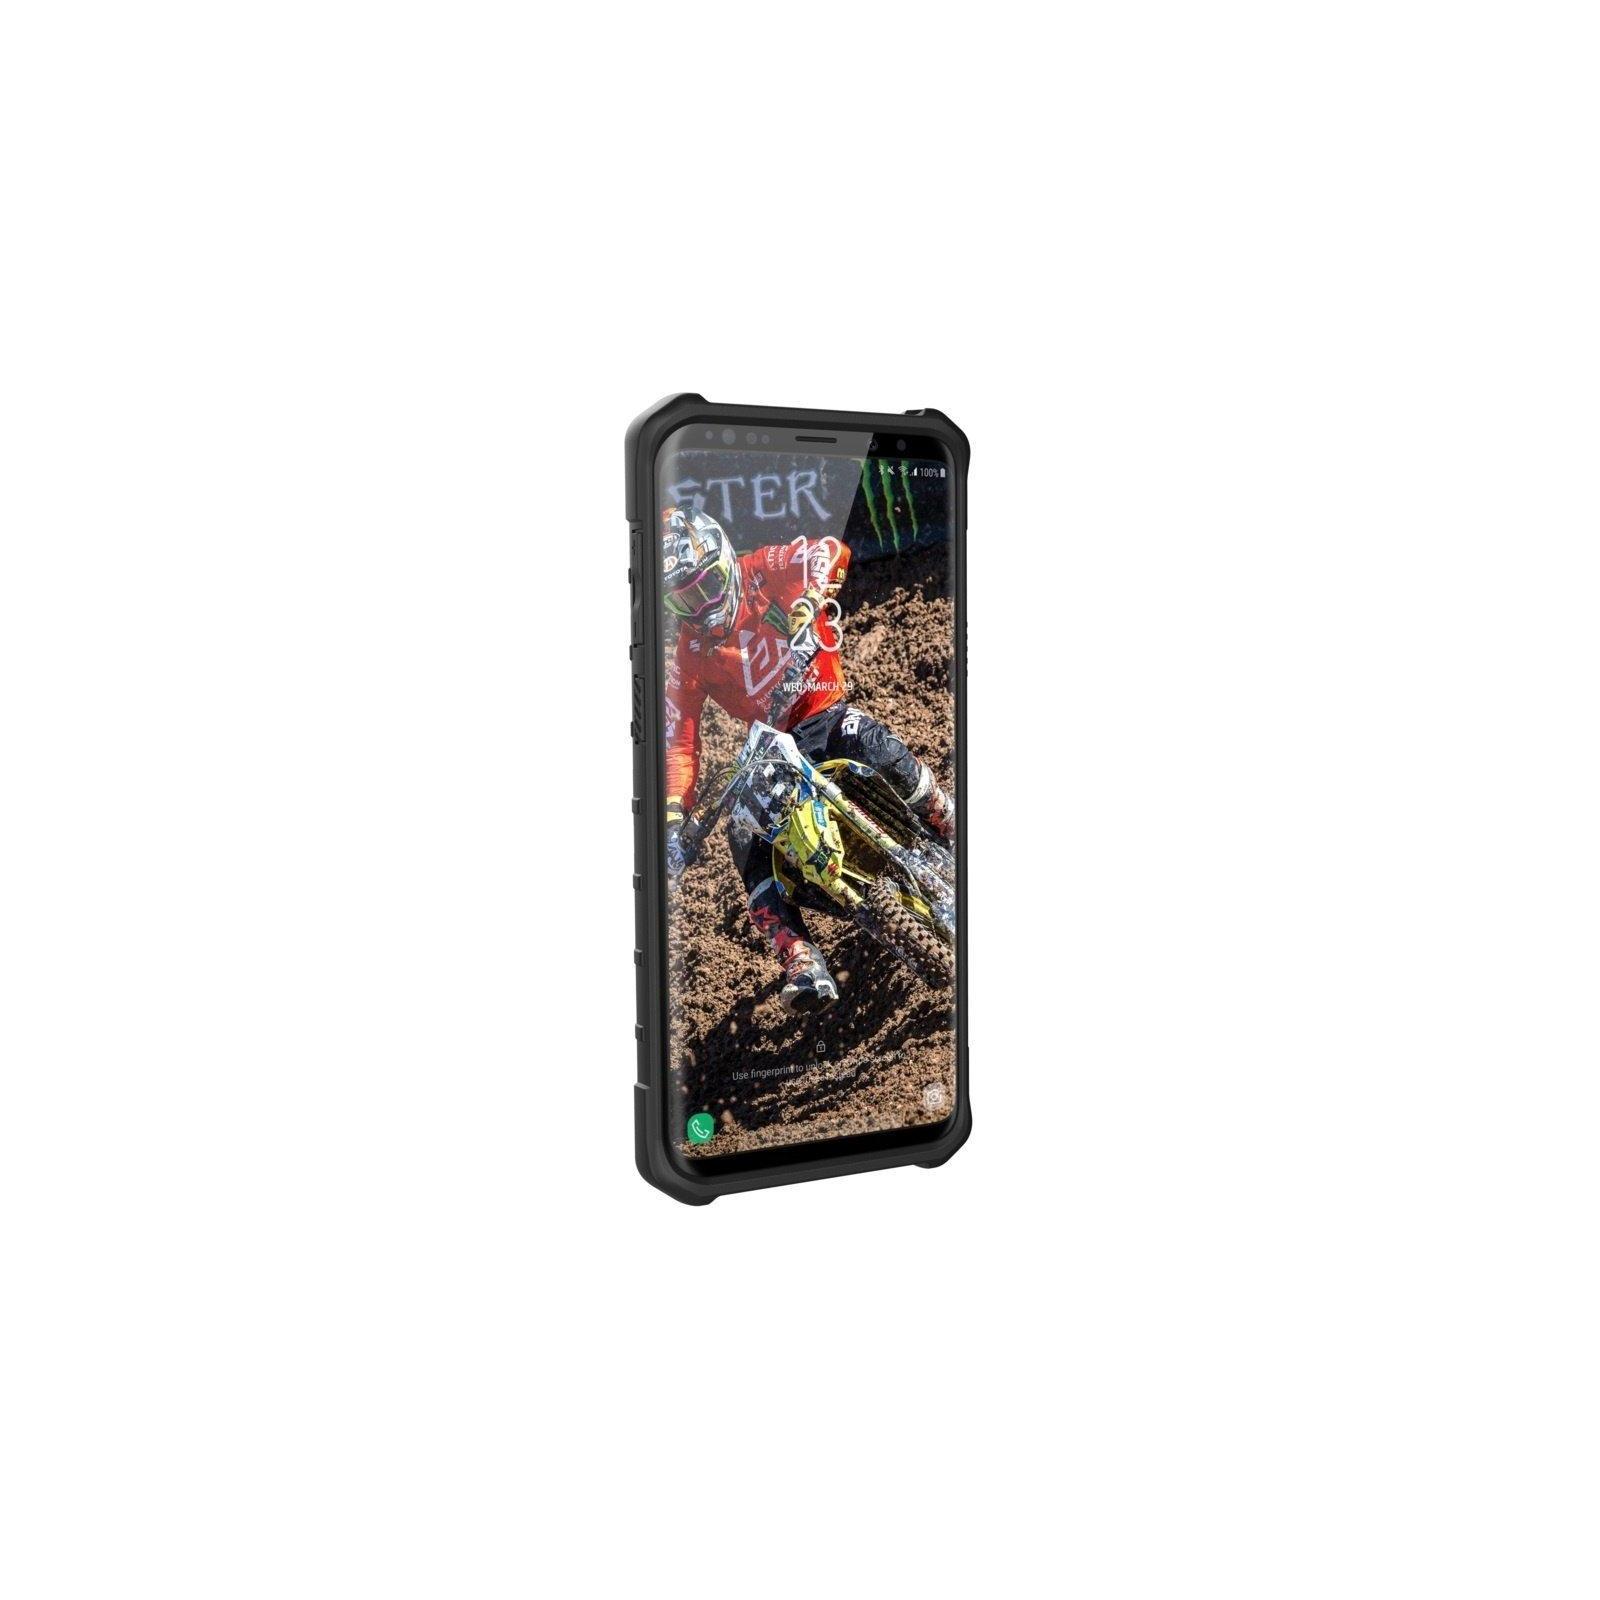 Чехол для моб. телефона Urban Armor Gear Galaxy S9+ Pathfinder Camo Gray/Black (GLXS9PLS-A-BC) изображение 5